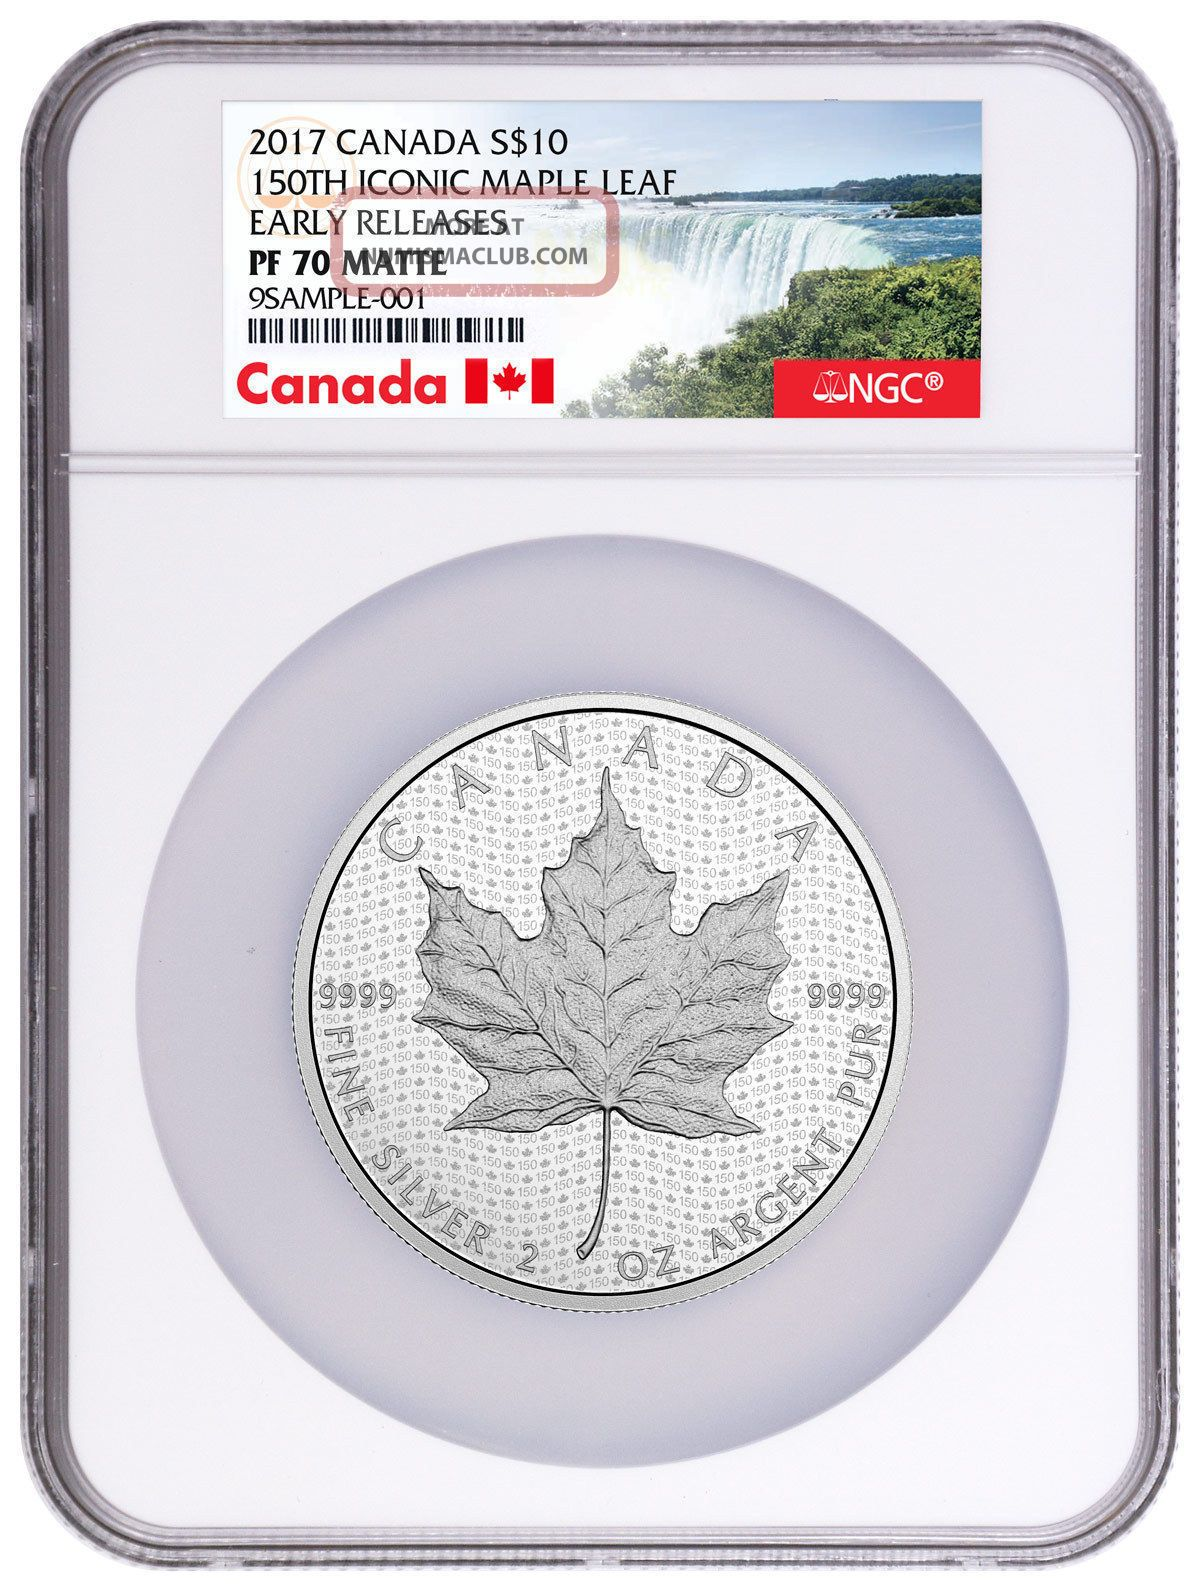 2017 Canada $10 2 Oz Matte Silver Canada 150th Ngc Pf70 Er Canada Label Sku44627 Coins: Canada photo